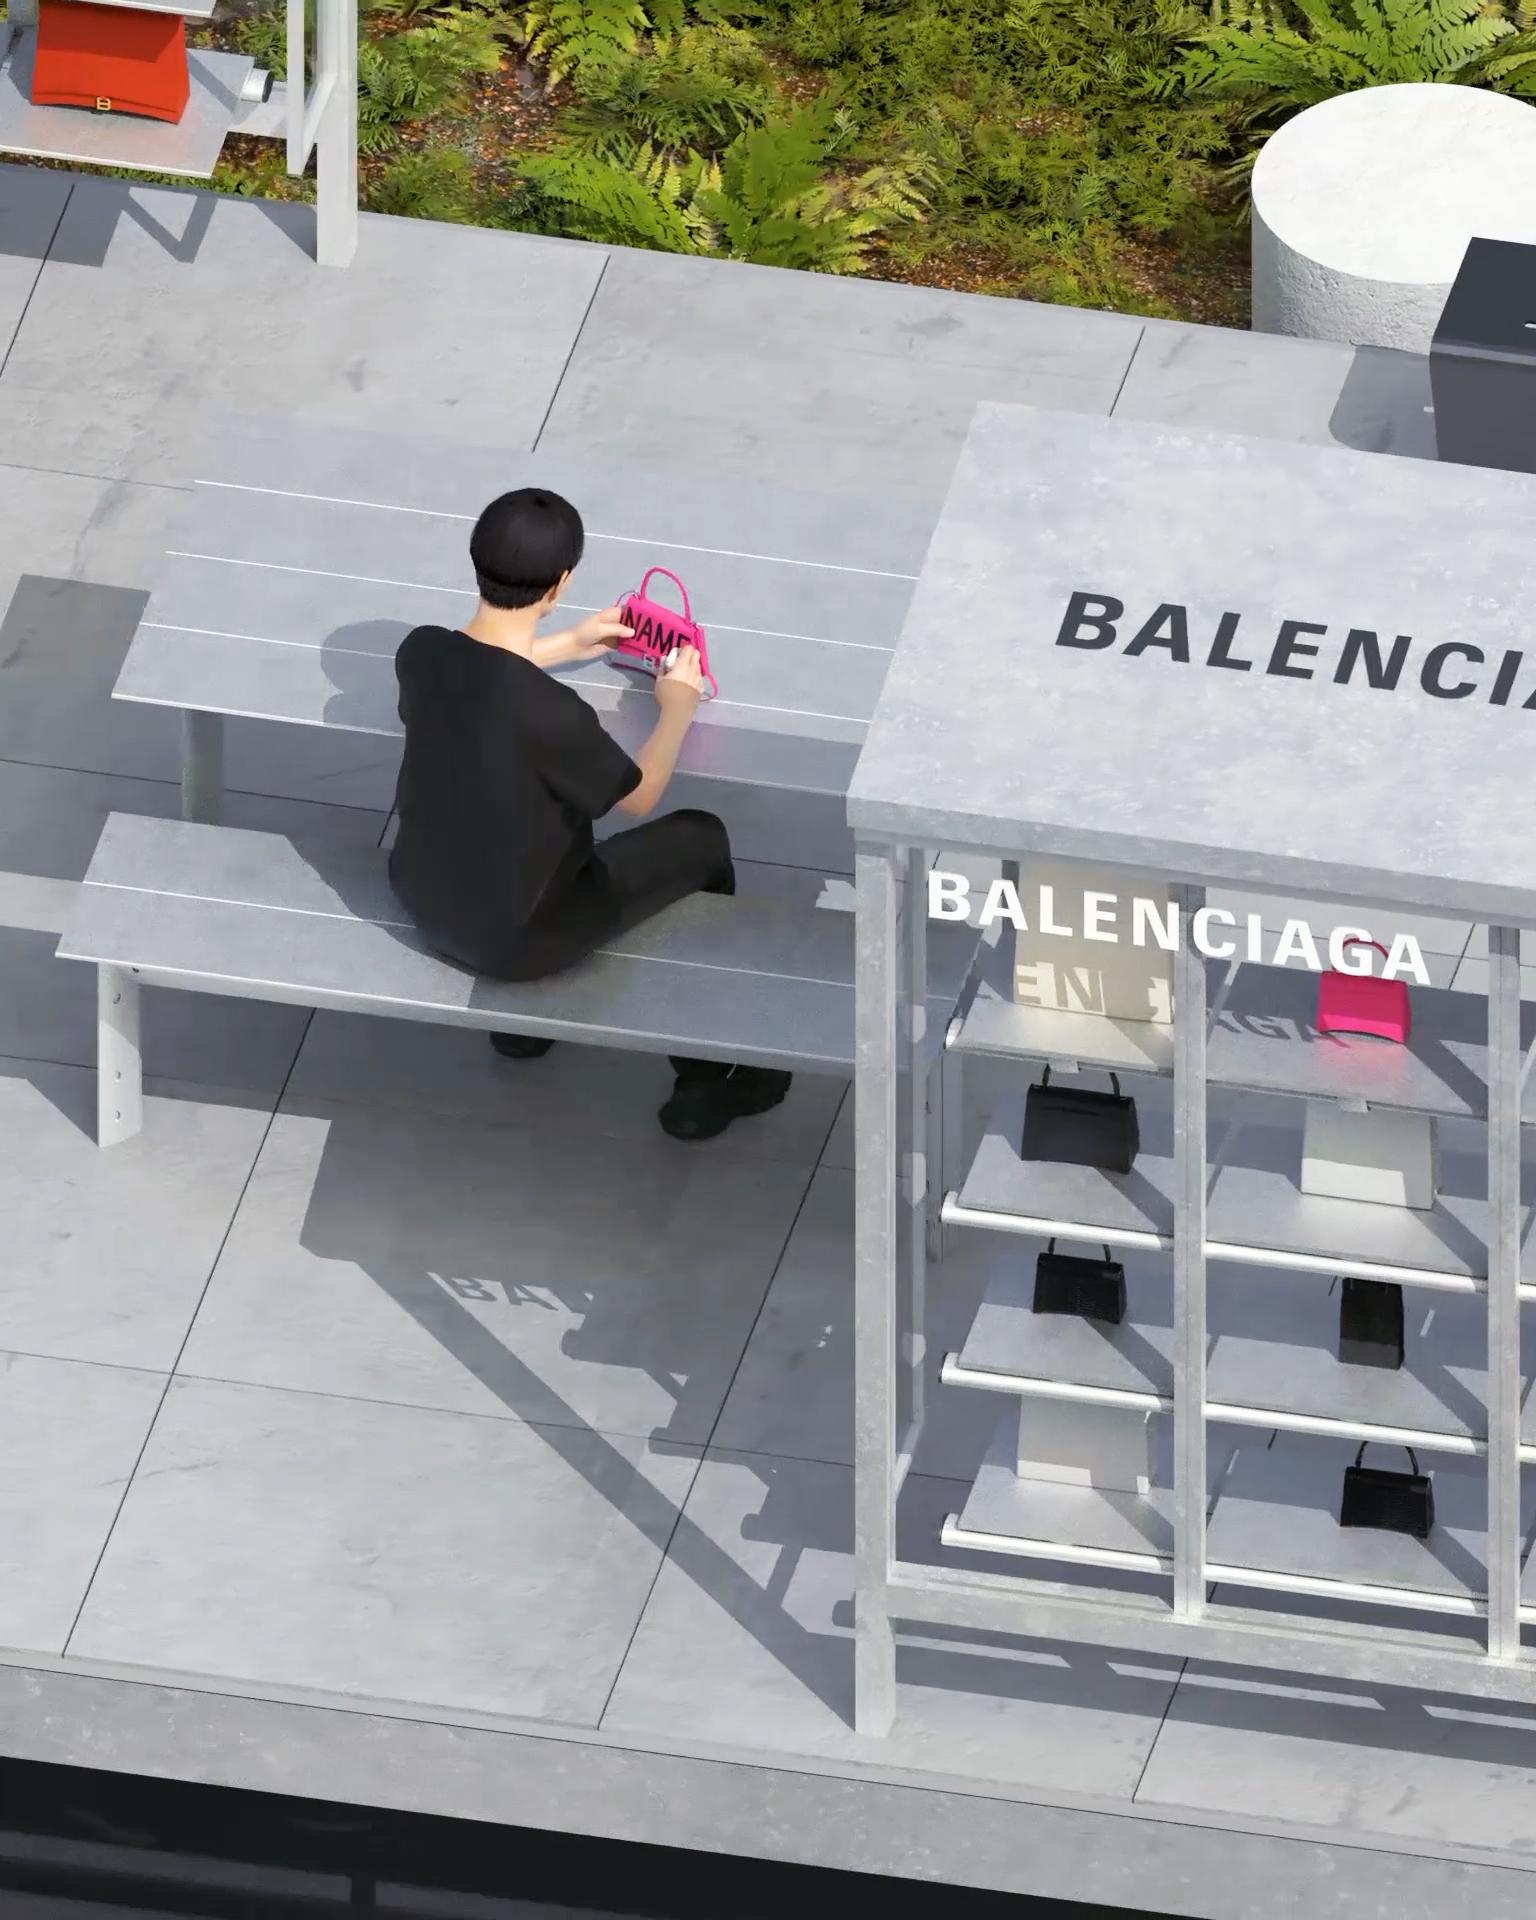 BALENCIAGA 特選包款限時專賣店及塗鴉訂製服務